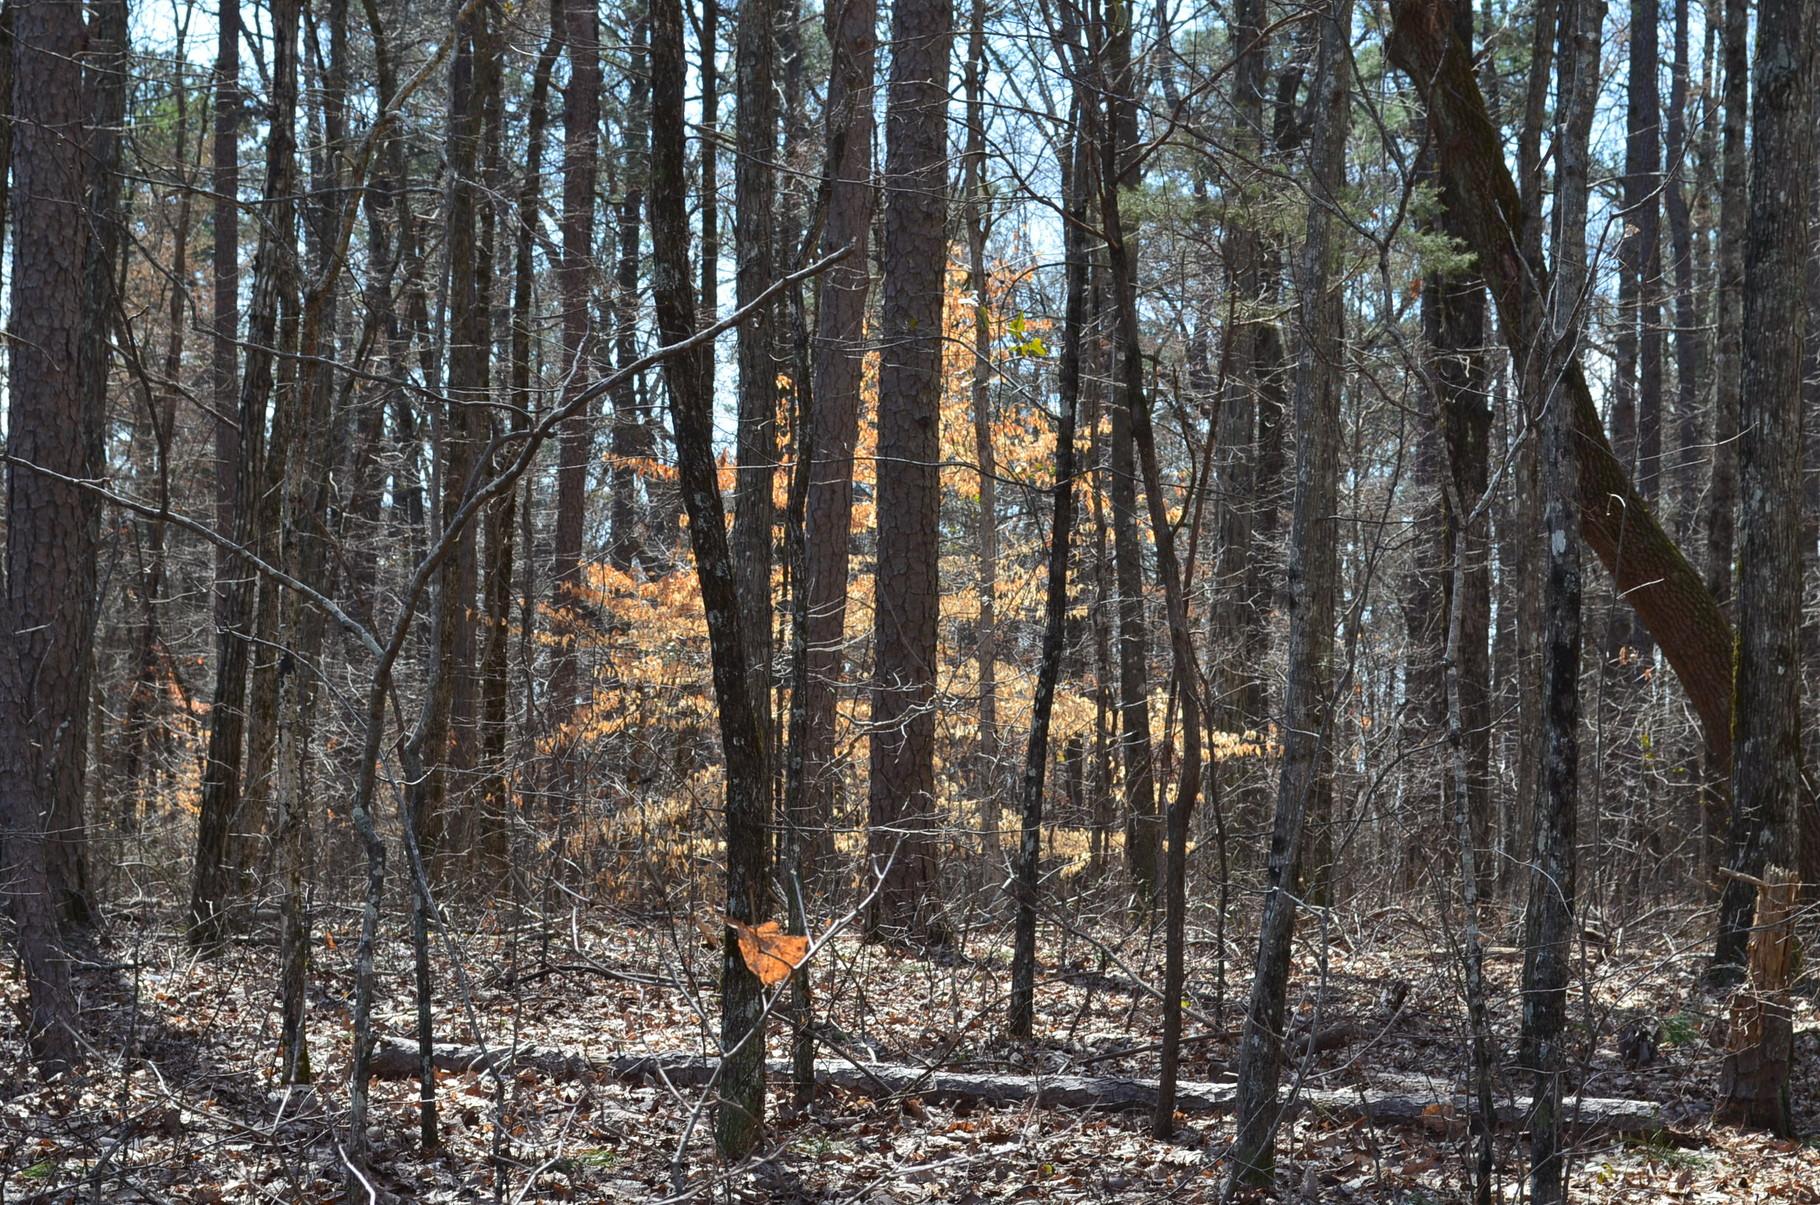 goldener Baum inmitten blätterloser Bäume